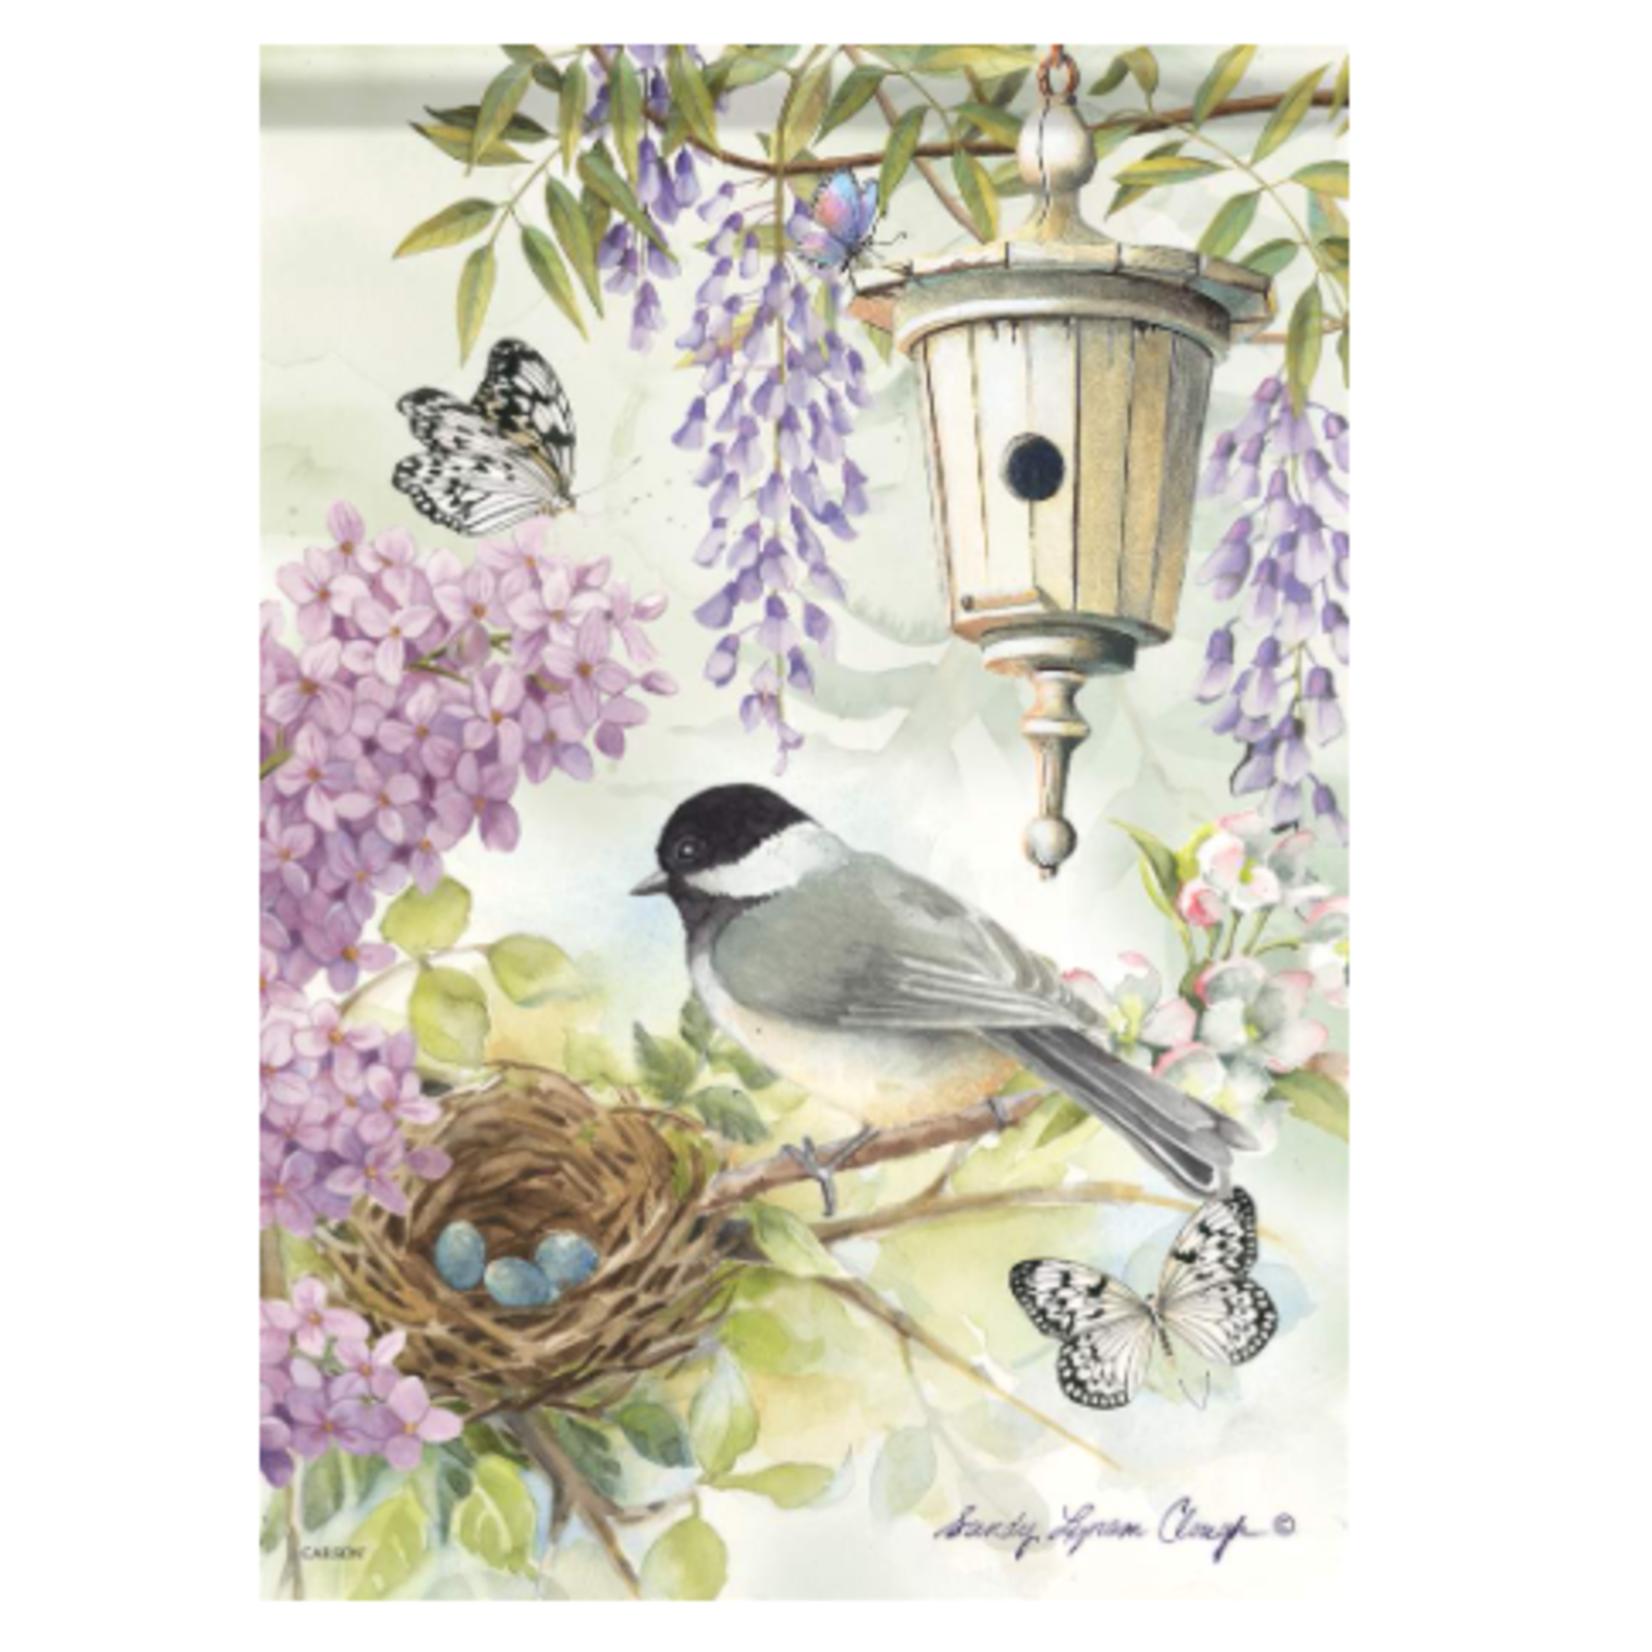 Garden Flag - Chickadee Birdsong